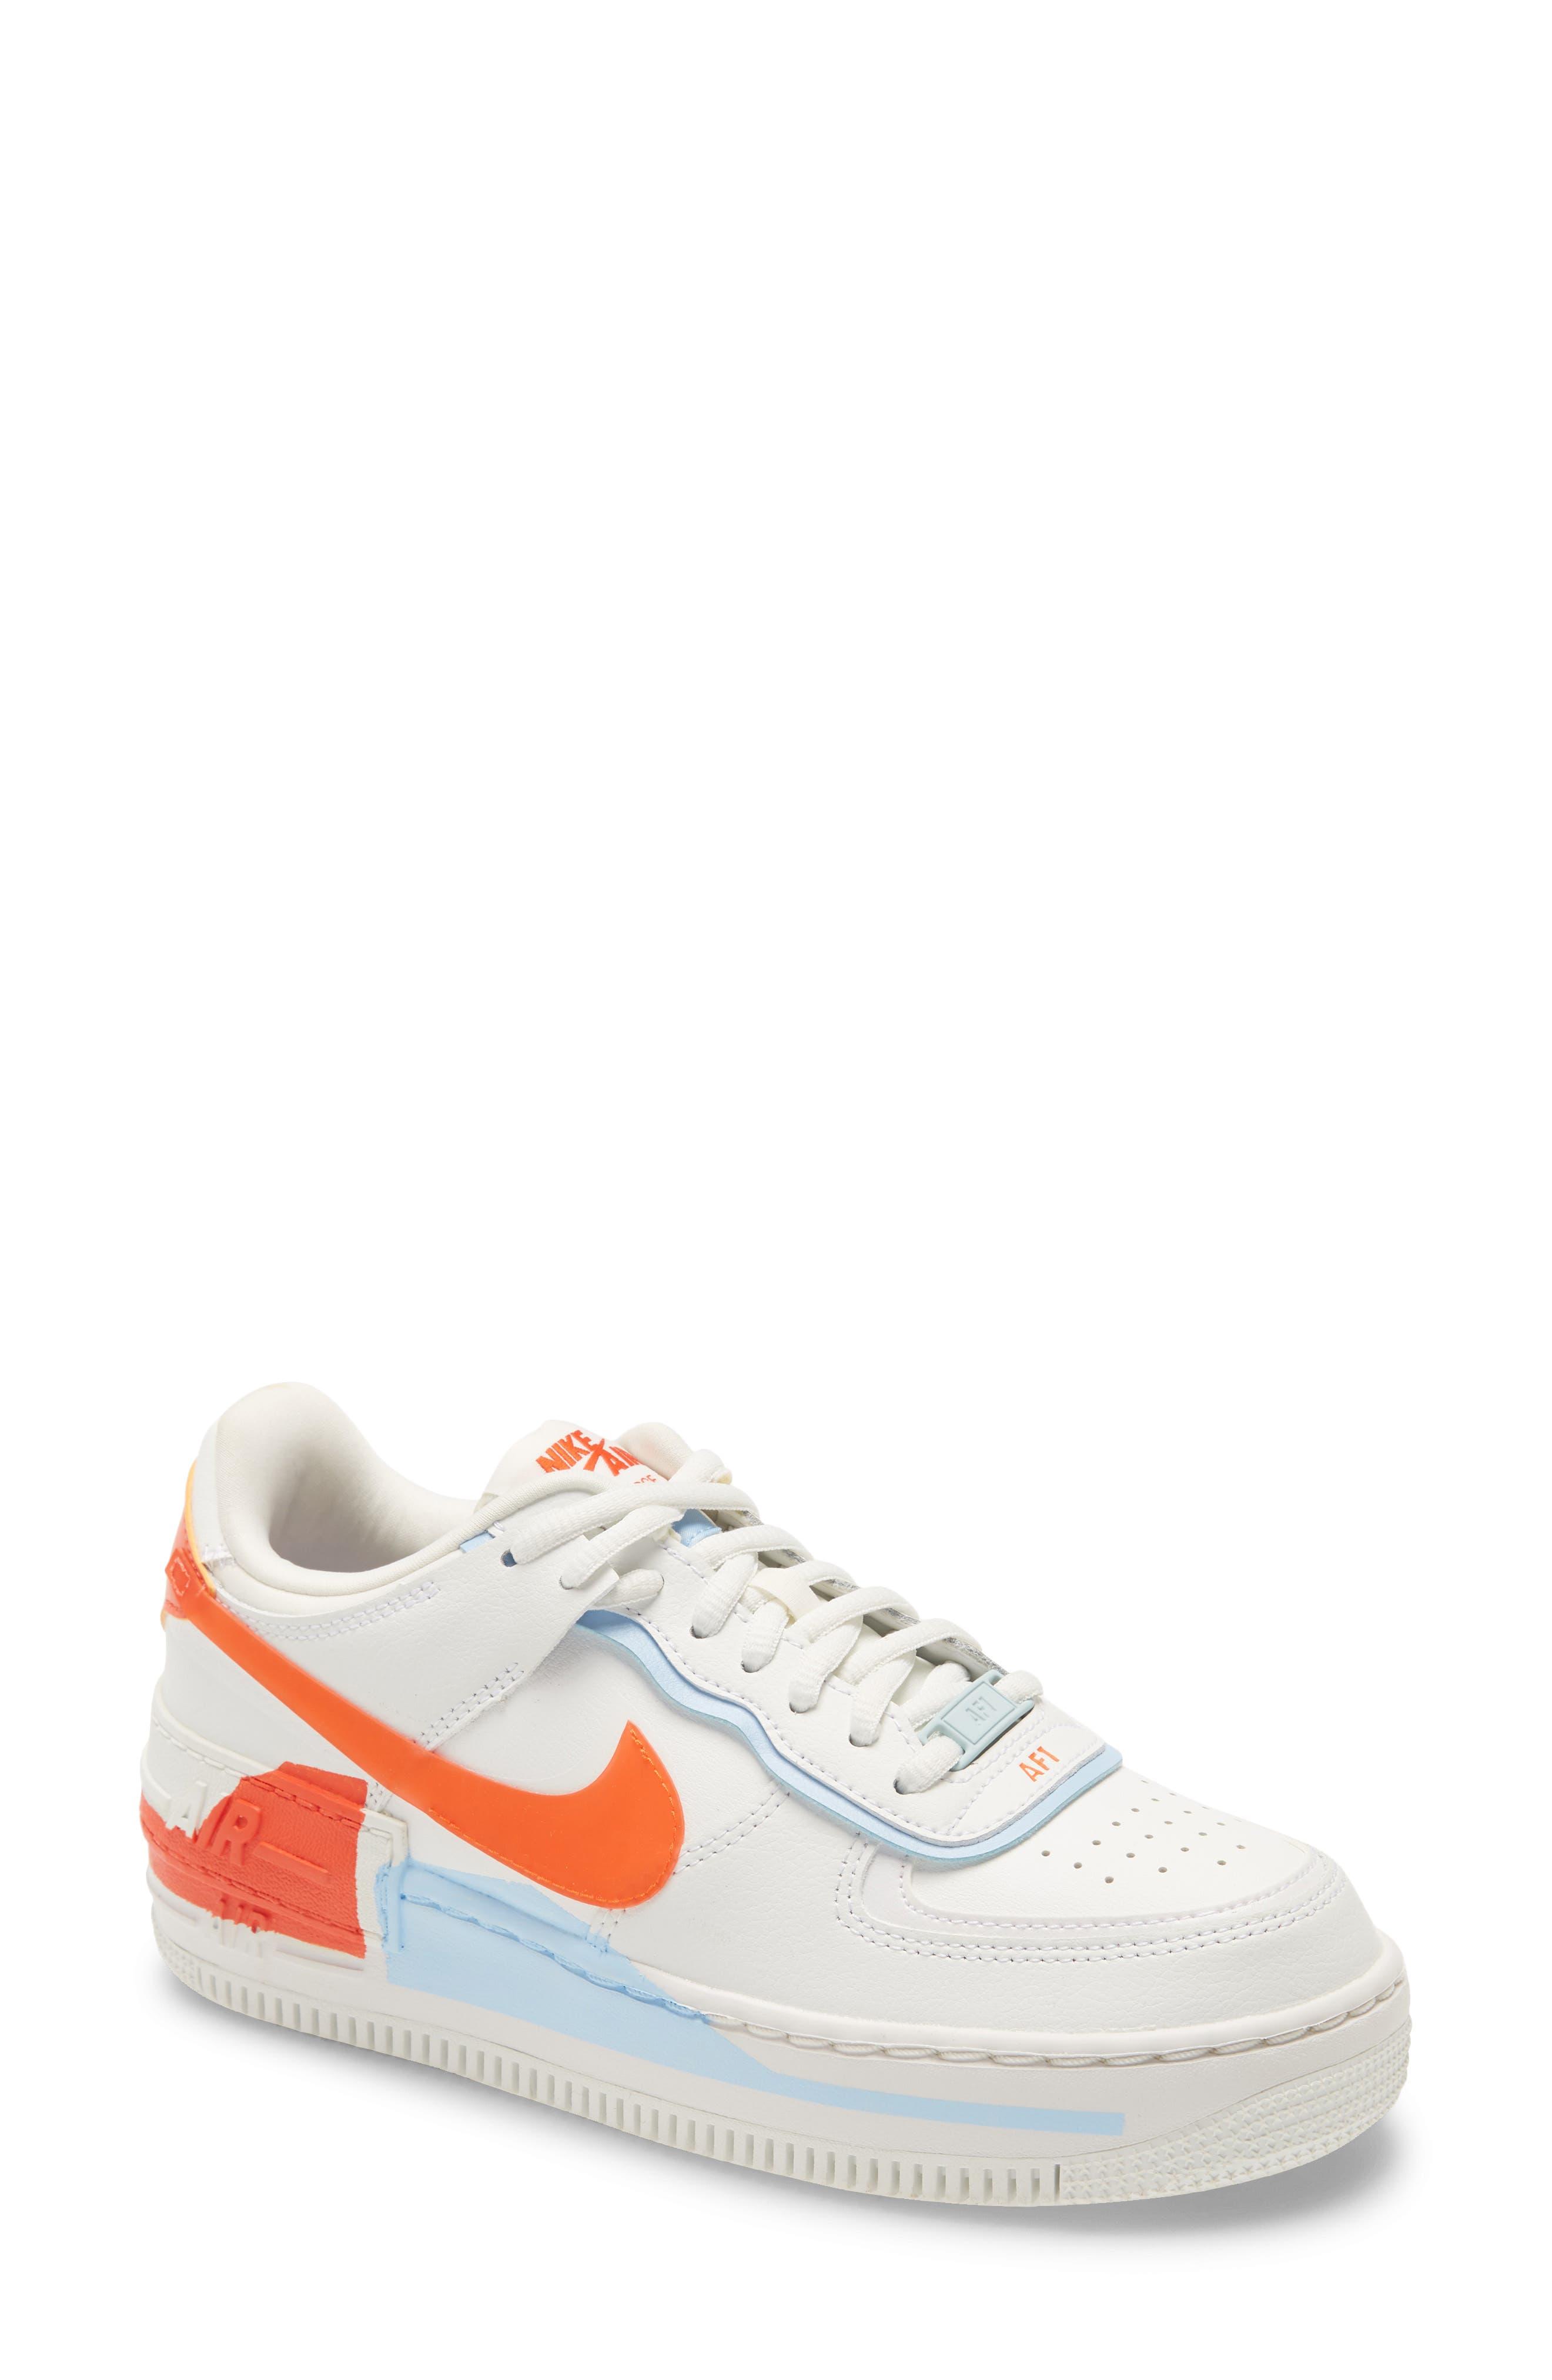 Nike Air Force 1 Shadow Sneaker (Women